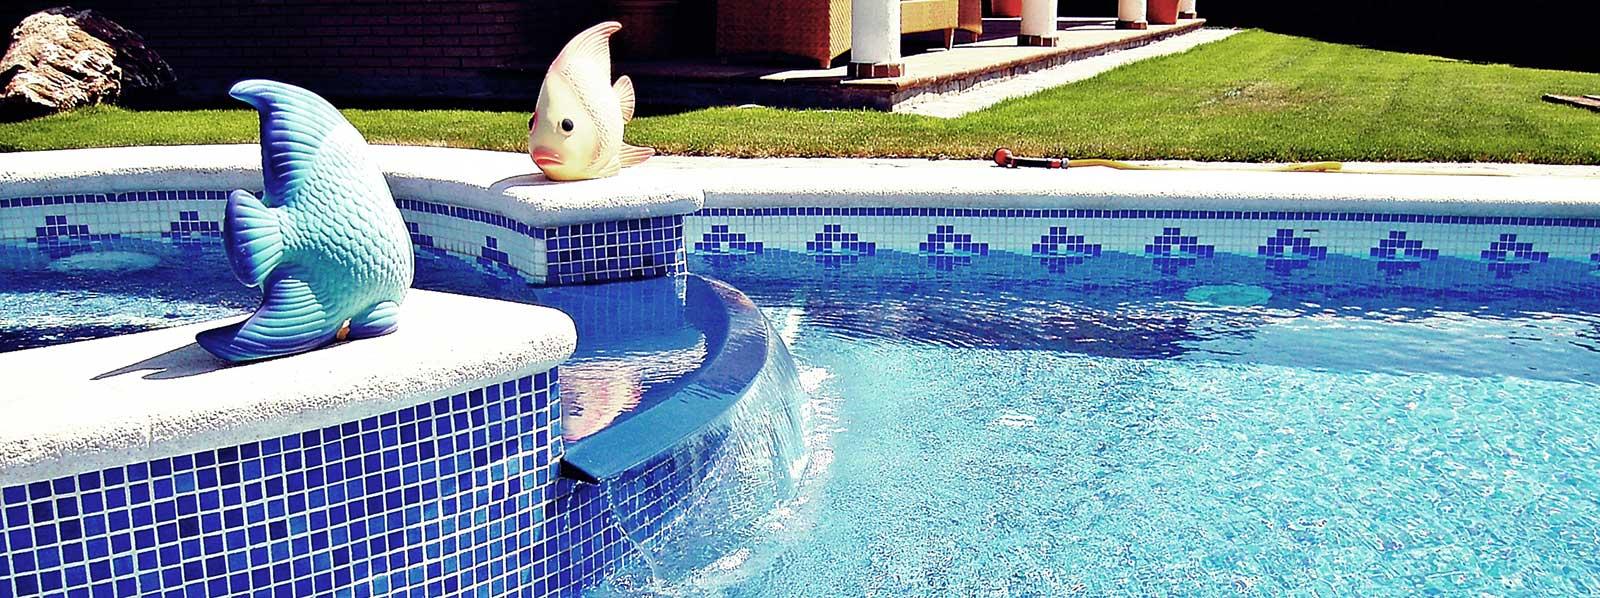 aguaviva-piscina-sli-02